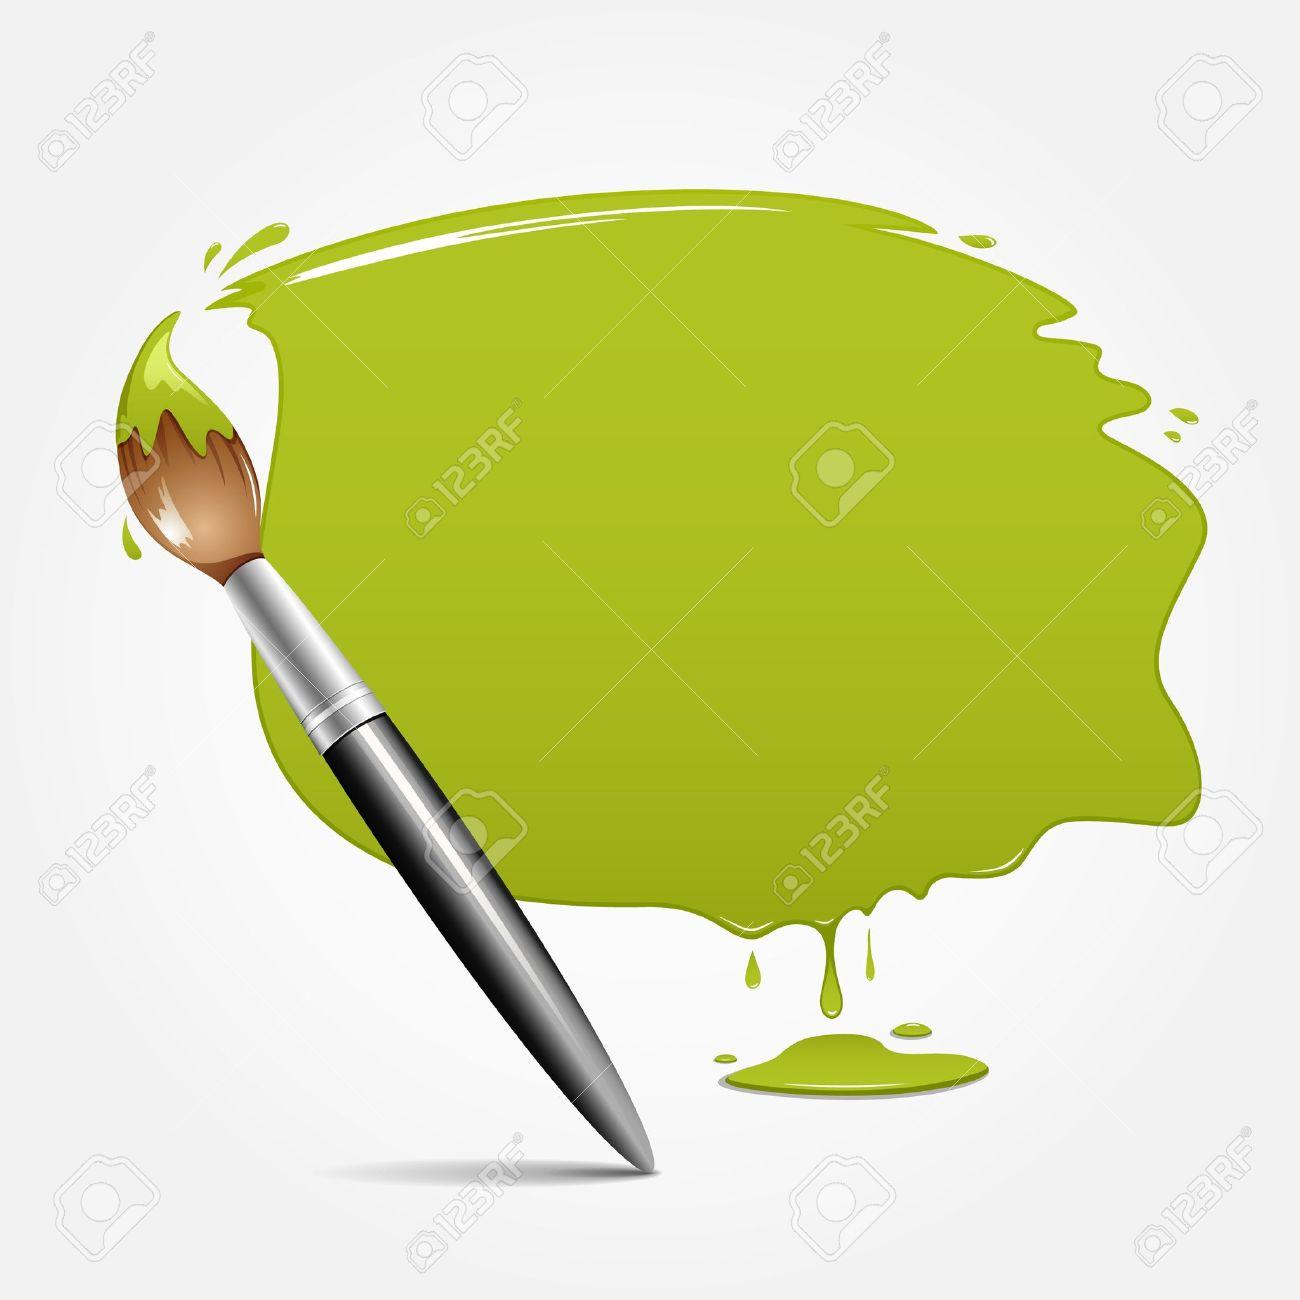 Paint brush green background, vector illustration - 14615688